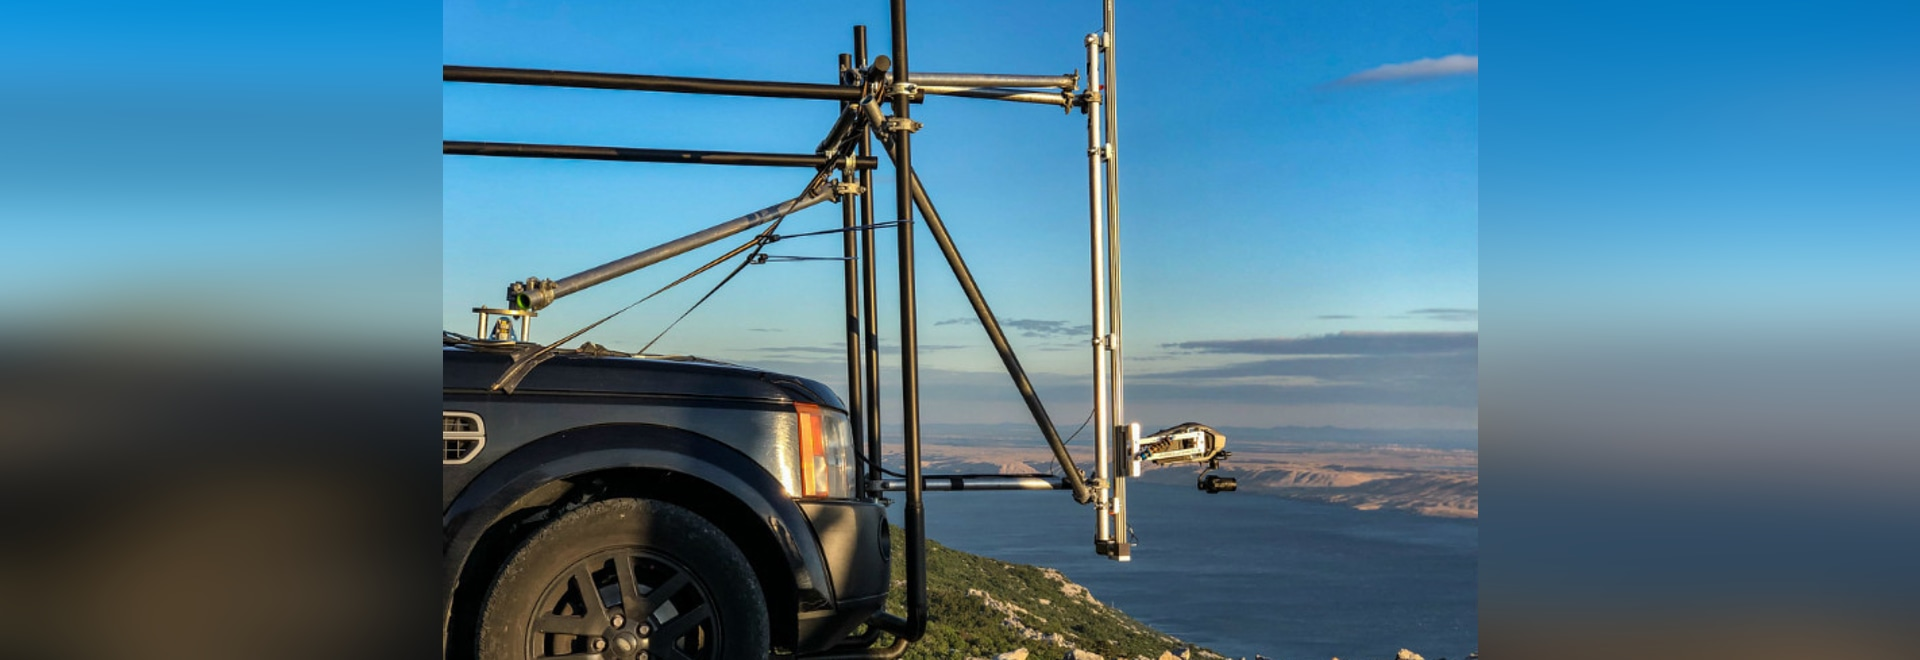 belt driven guide system camera rig